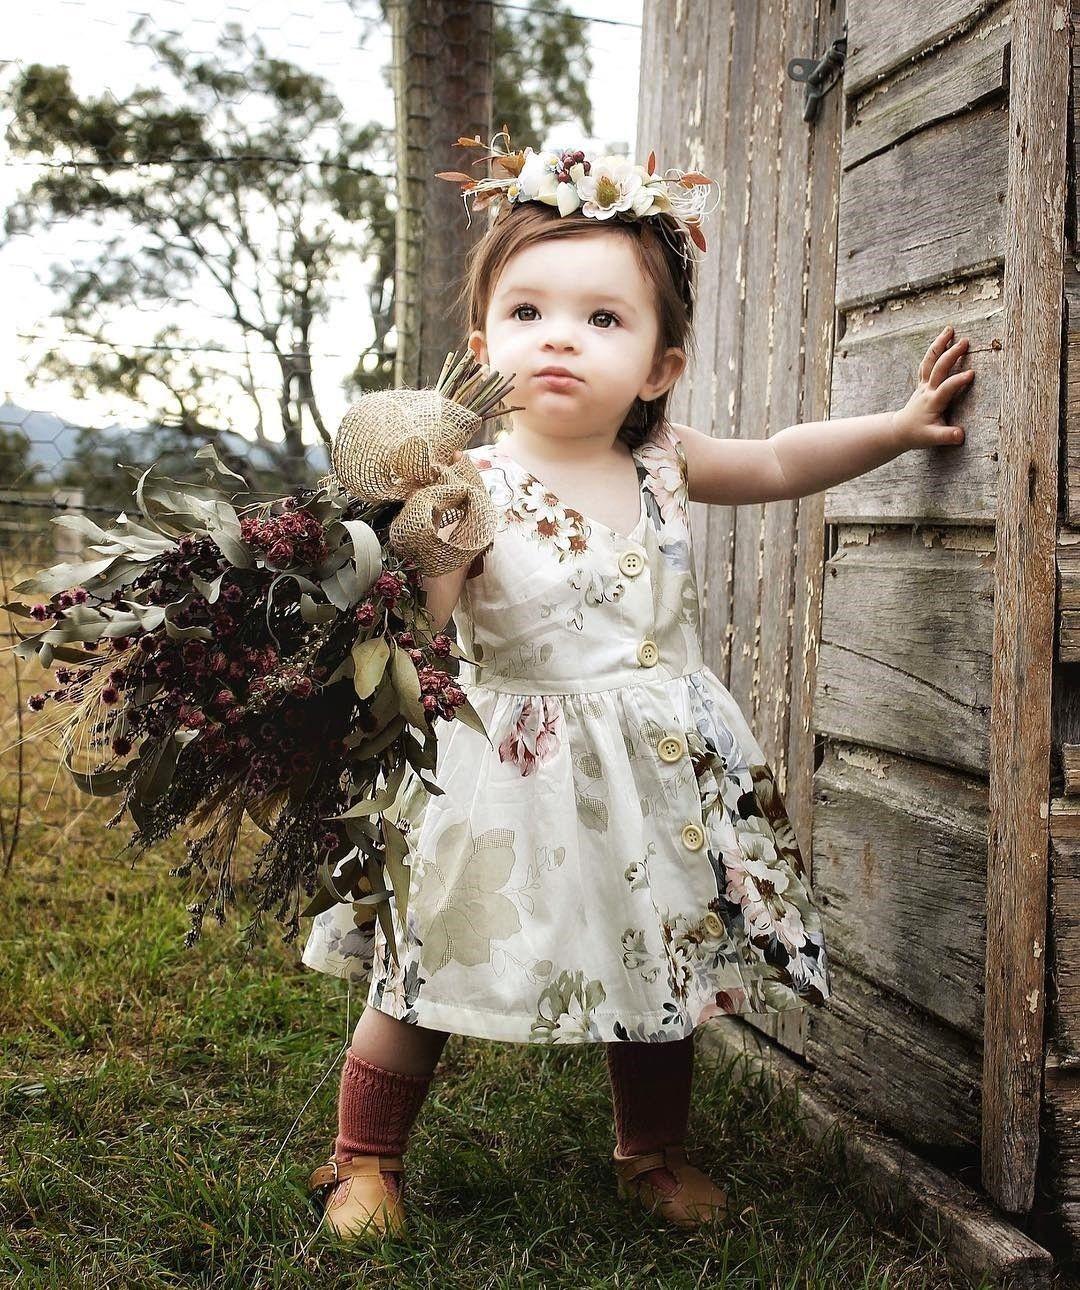 Summer Baby Kids Girls Princess Dress Pageant Sleeveless Button Floral Dresses